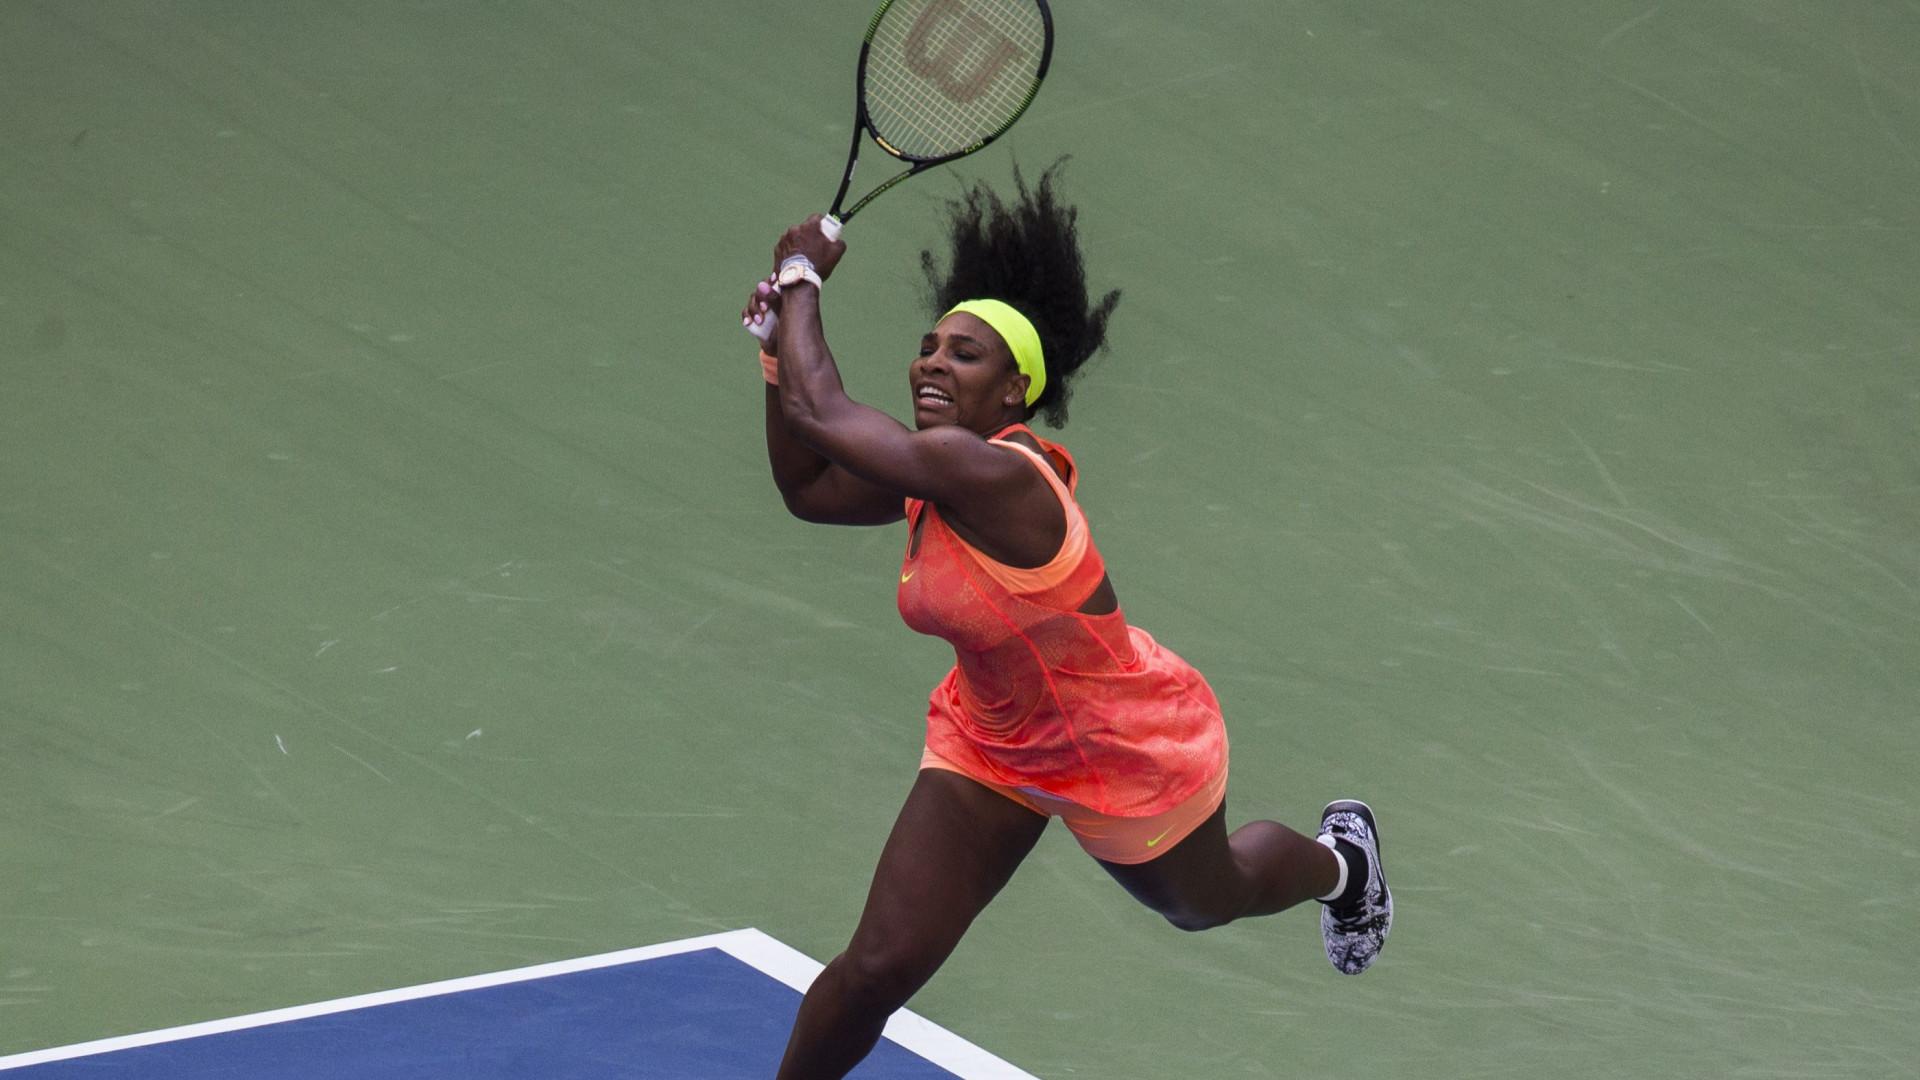 Aos sete meses de gravidez, Serena Williams ainda joga ténis